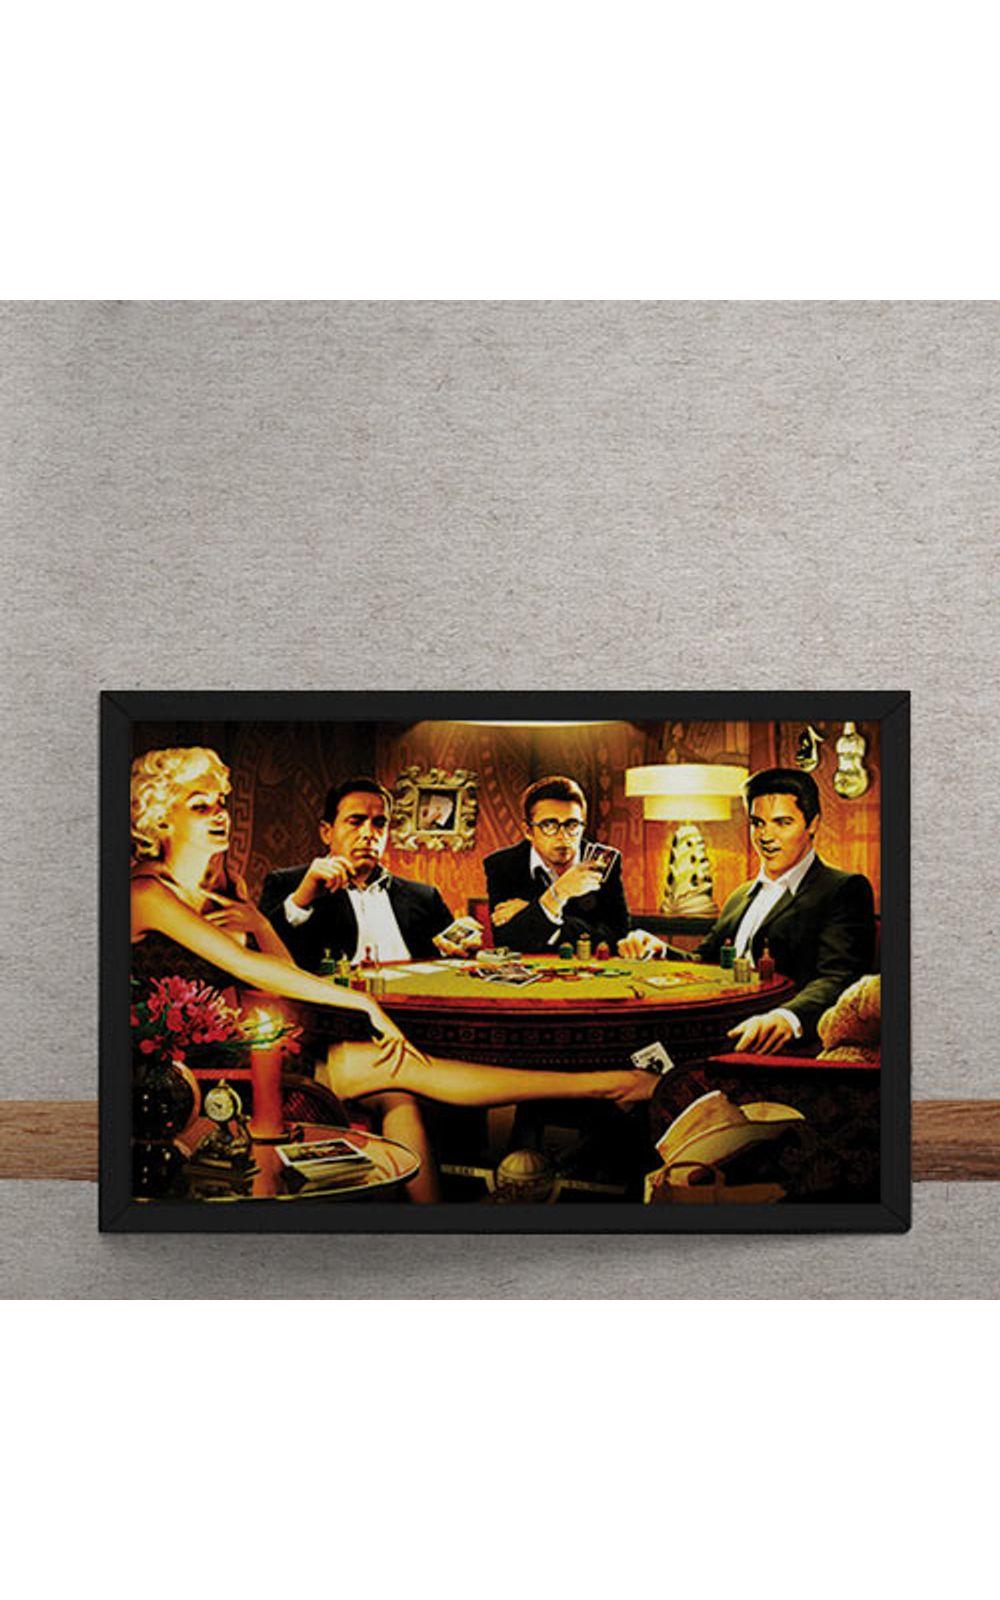 Foto 3 - Quadro Decorativo Baralho Marilyn Monroes Elvis Presley James Dean Humphrey Bogart